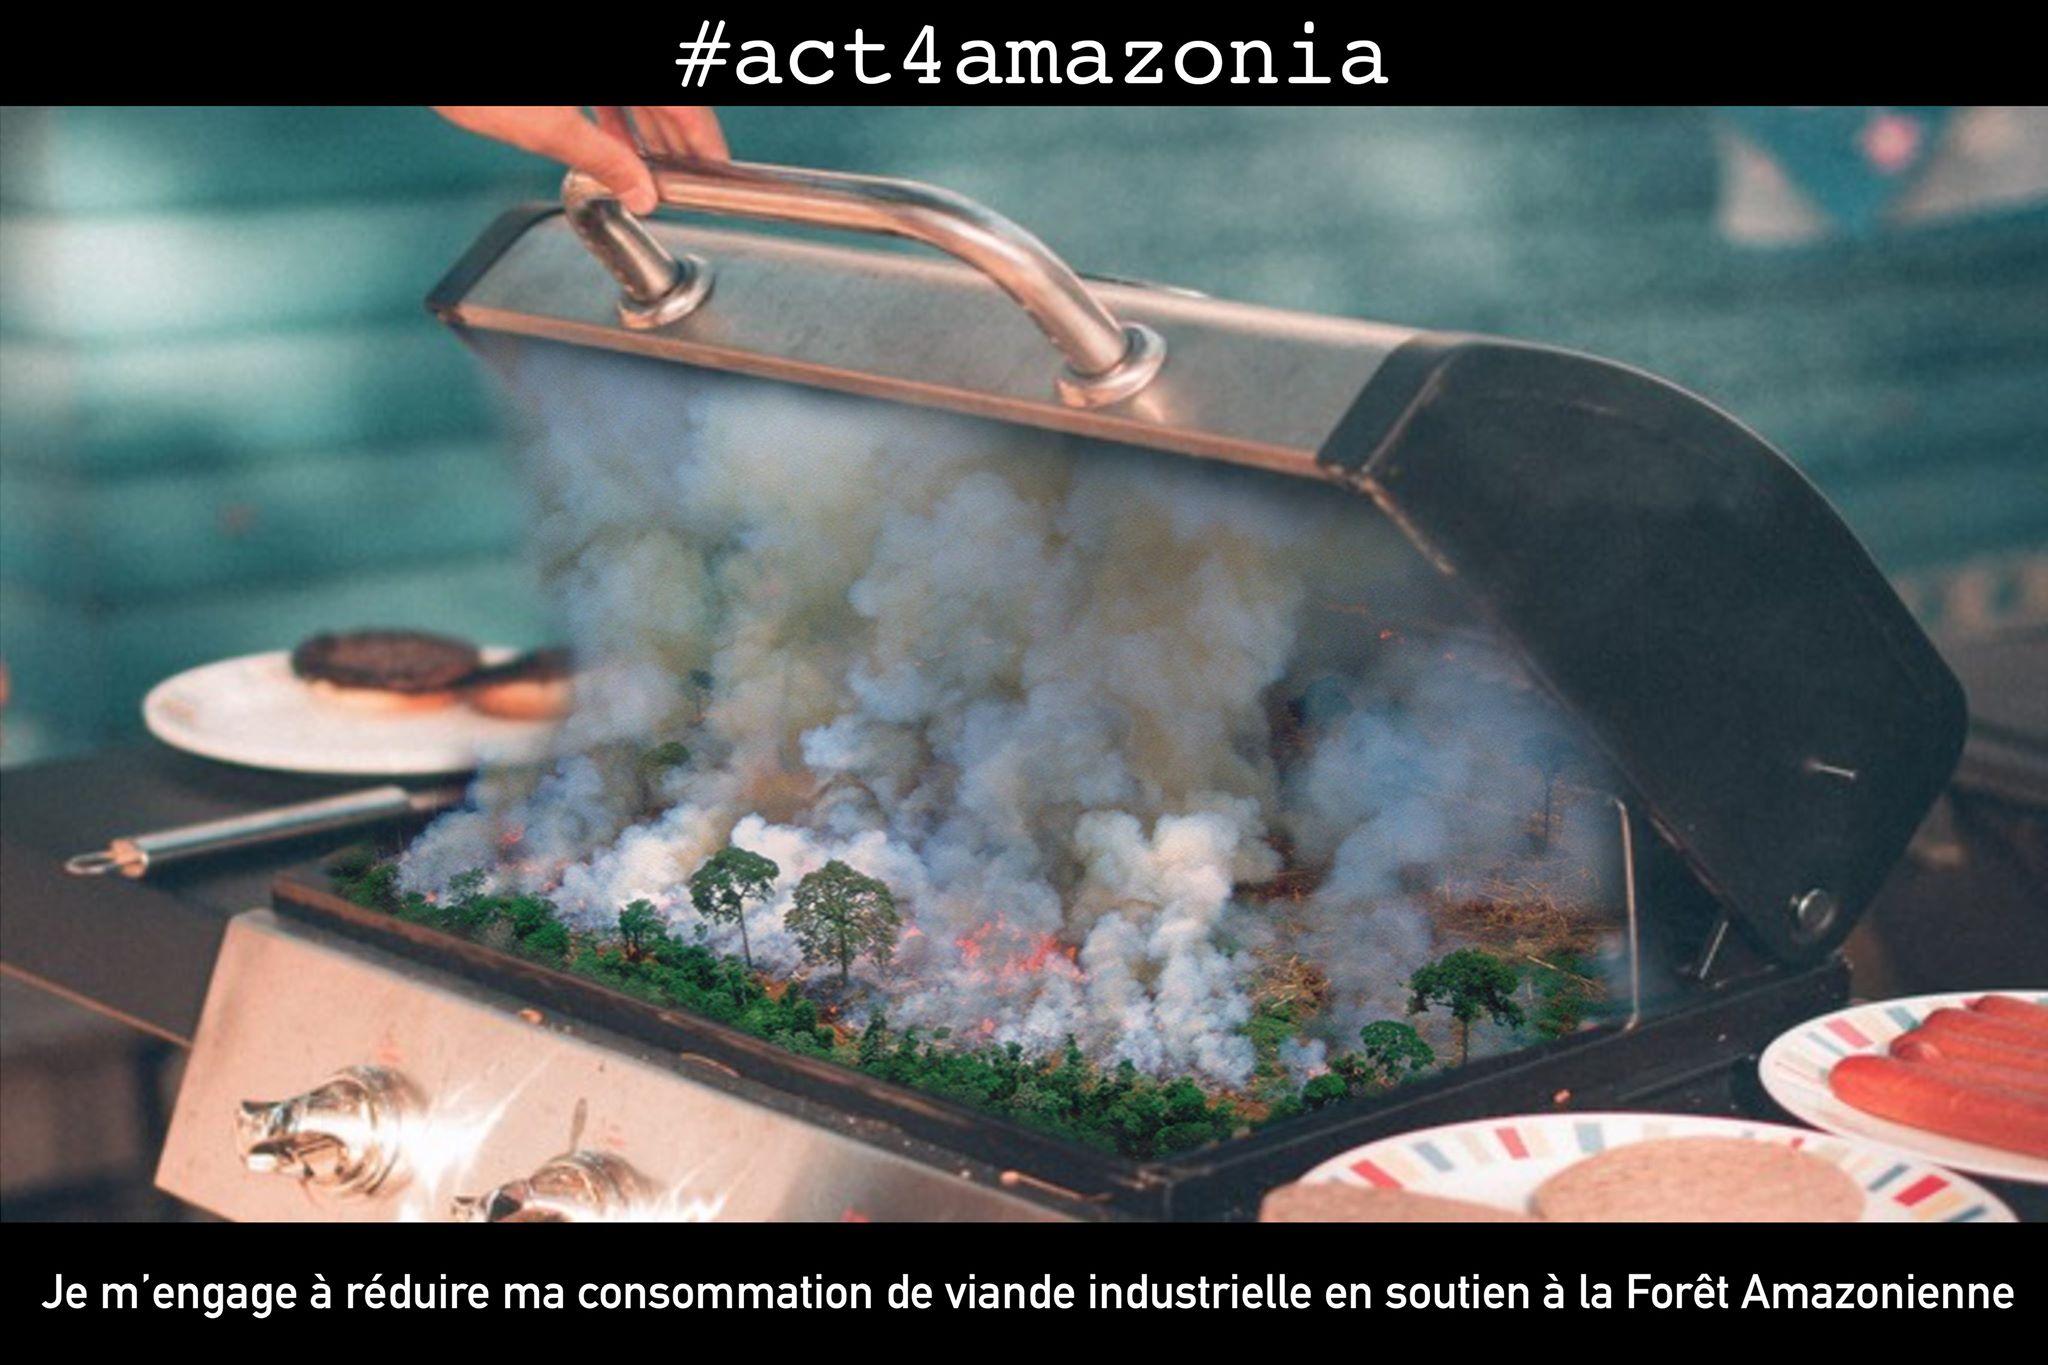 campagne_act4amazonia_visuel-1